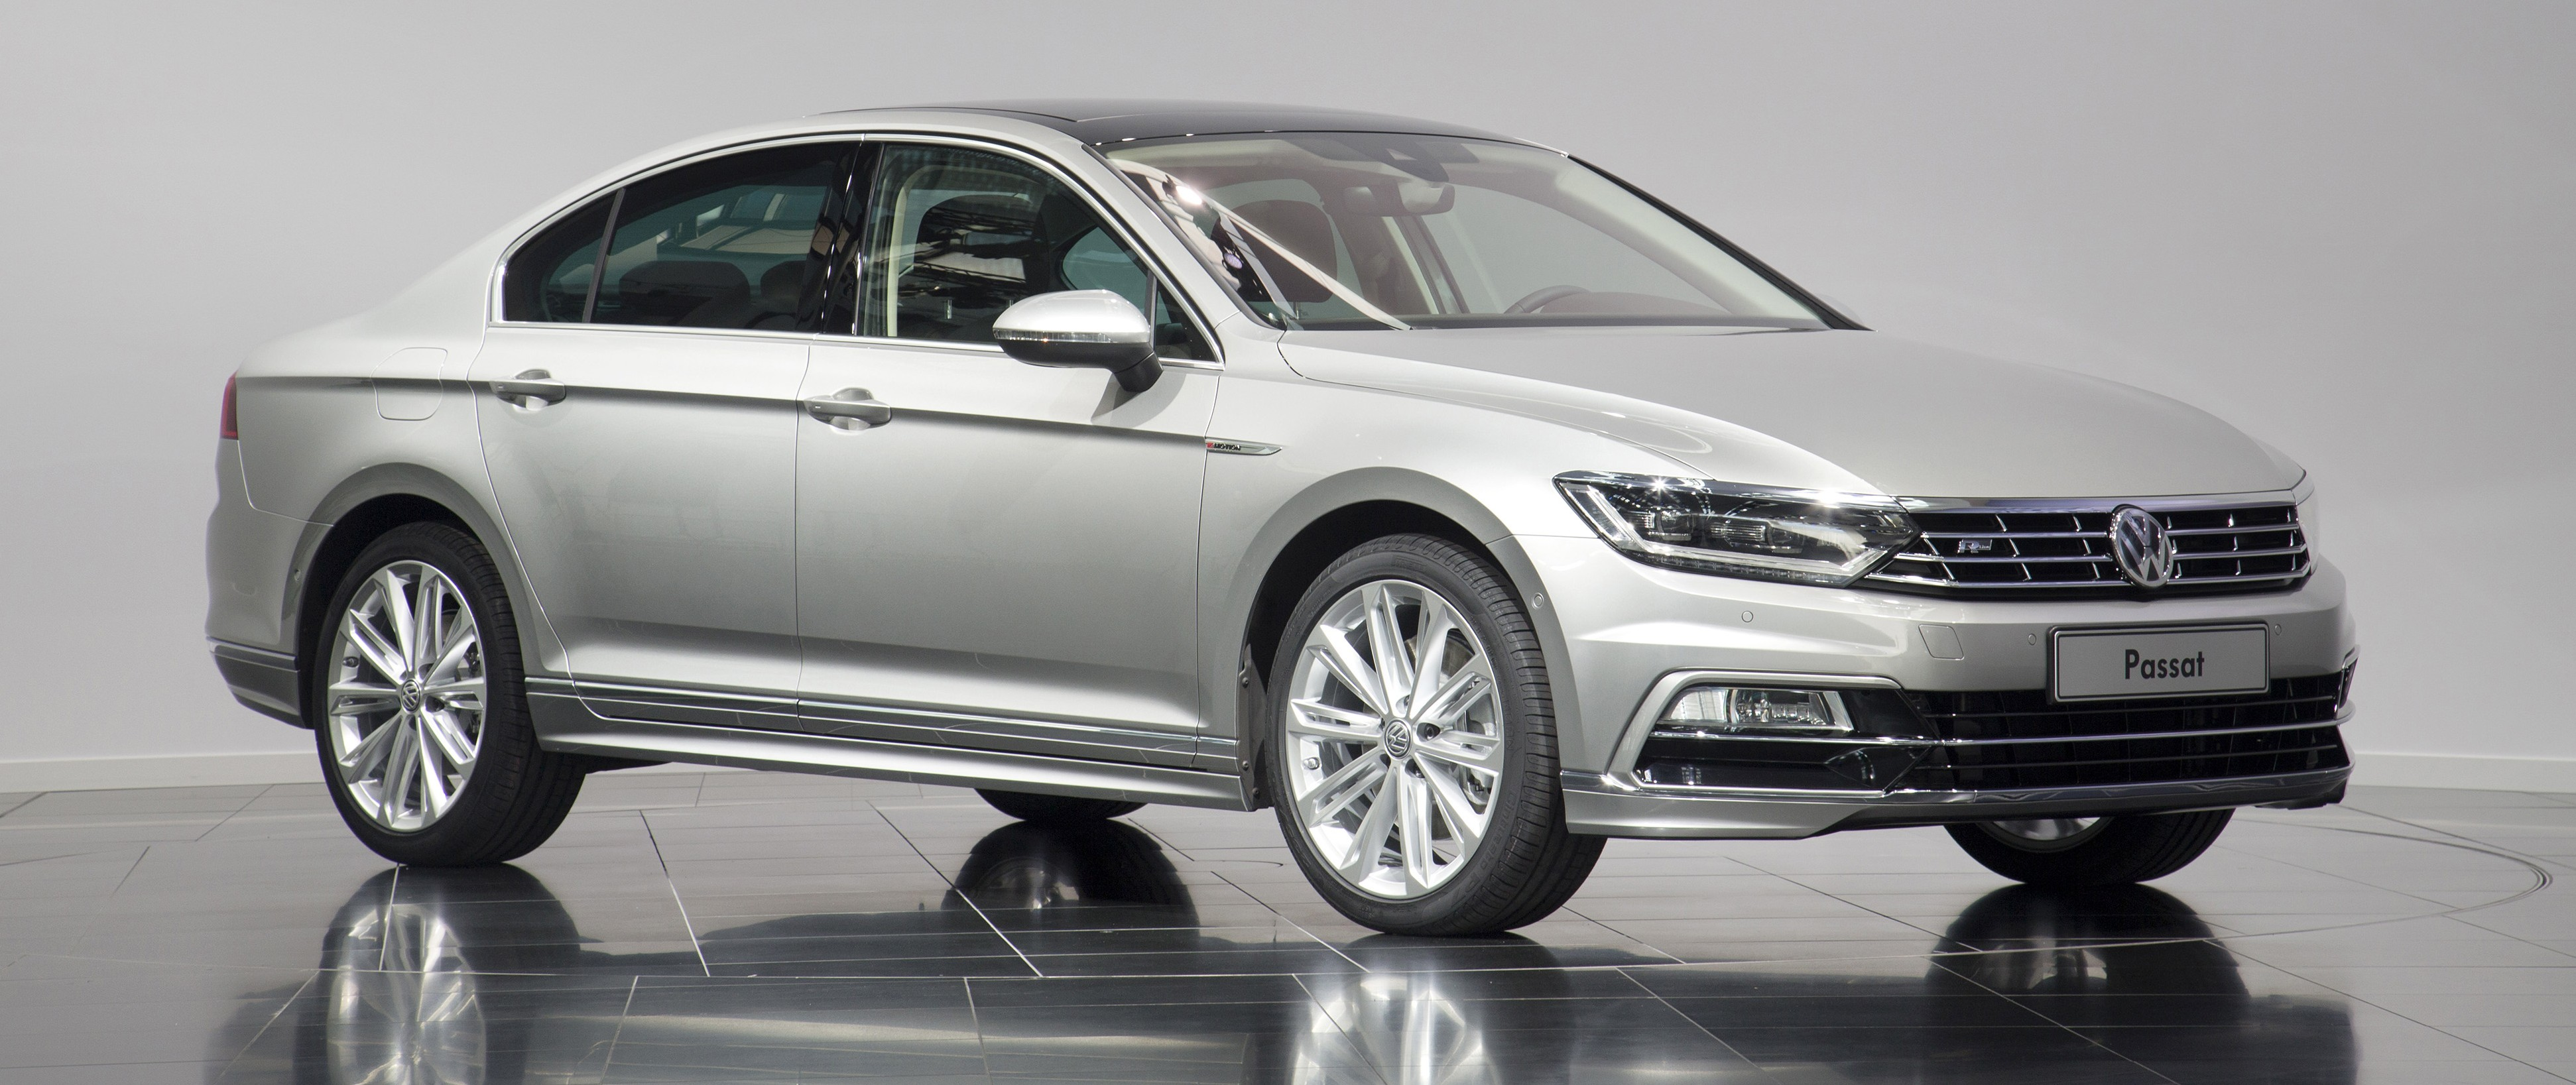 2015 Volkswagen Passat B8 Full Details Amp Photos Paul Tan